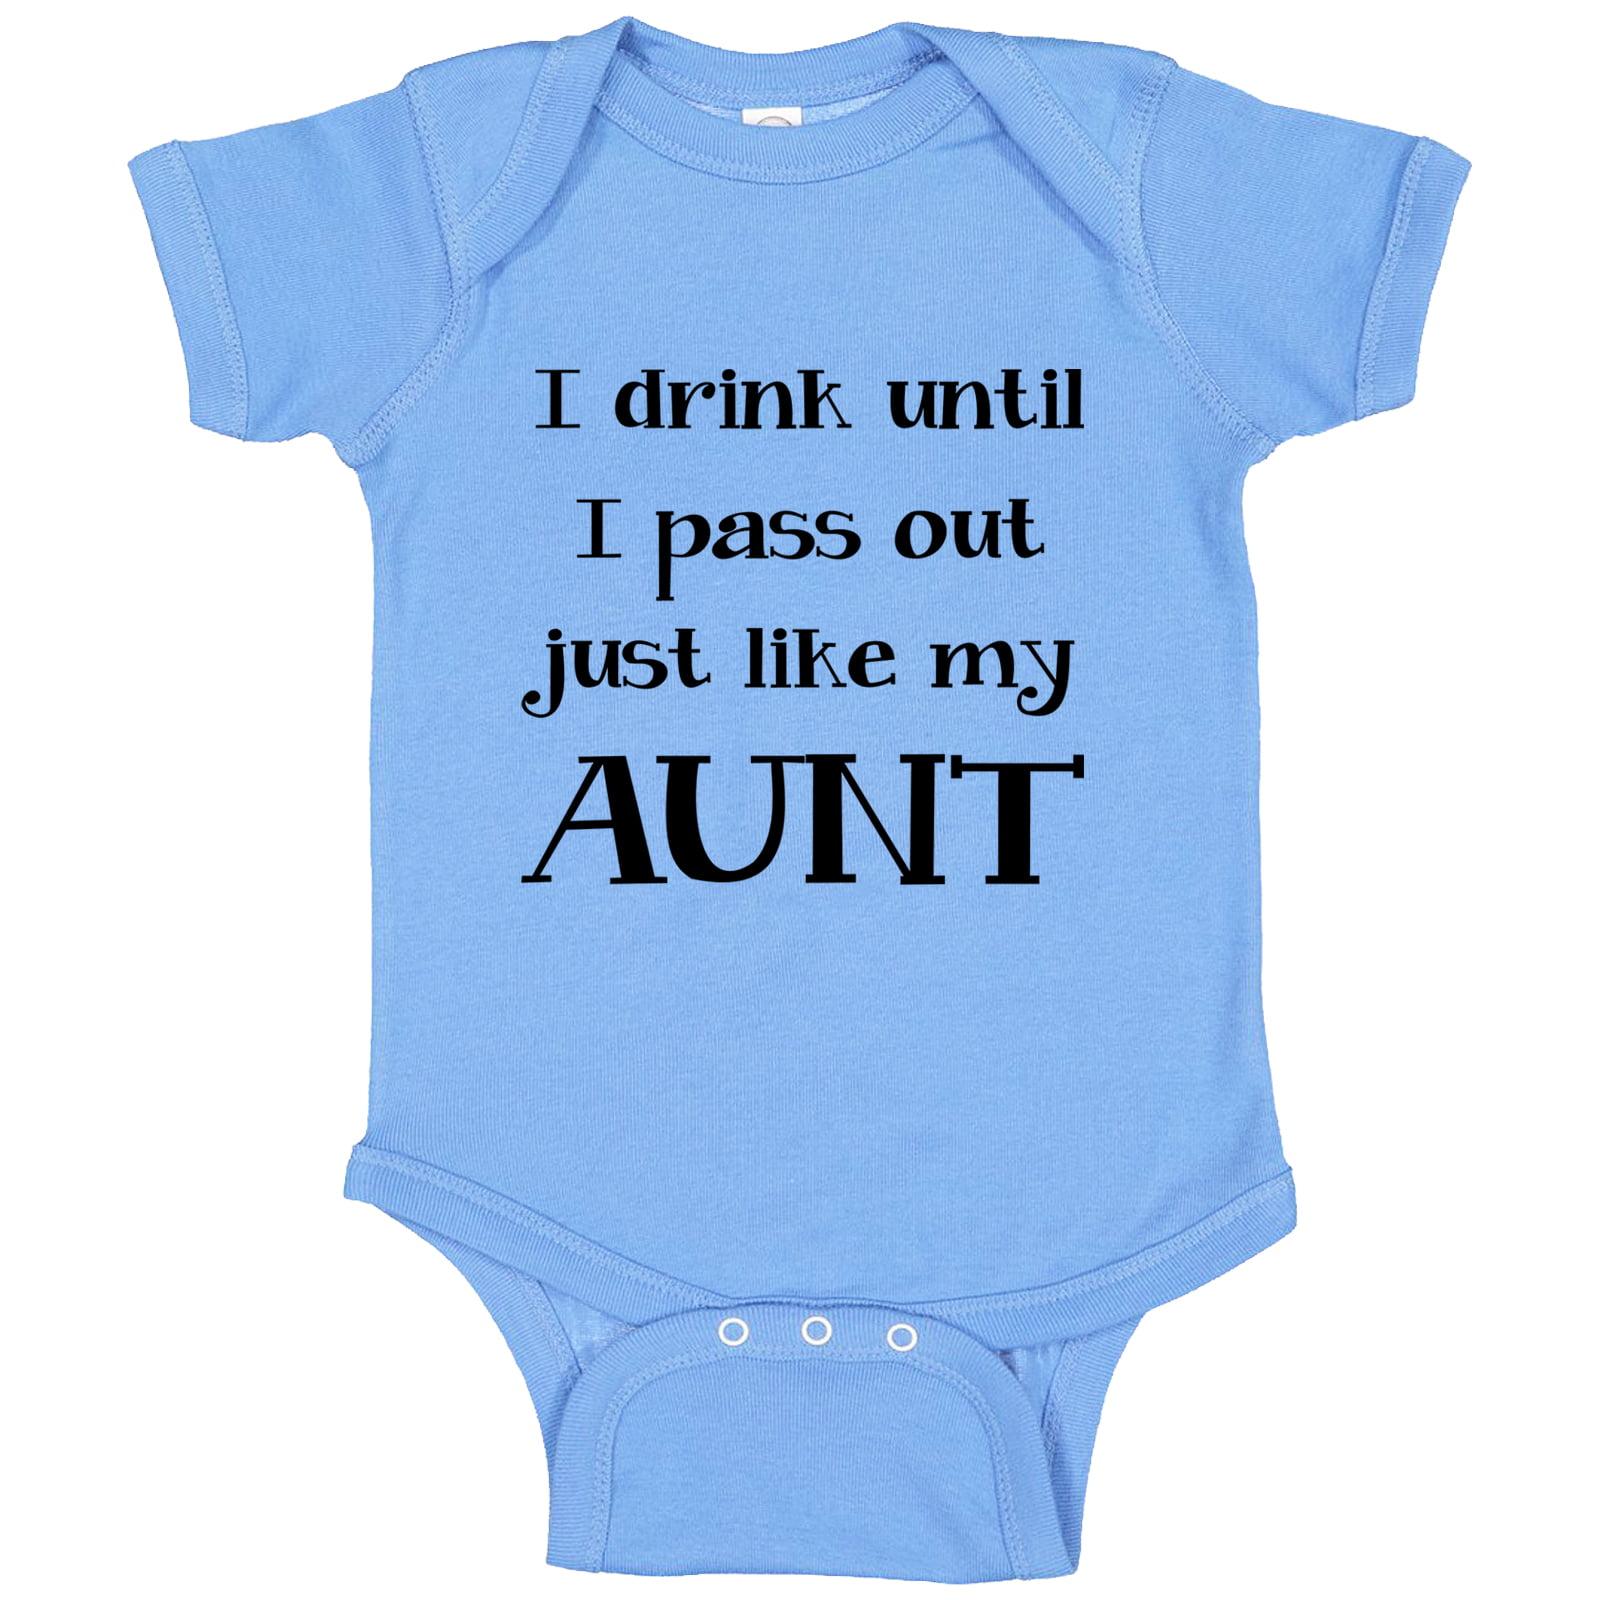 aunt baby bodysuit infant aunt baby clothing drink like my aunt Aunt baby one piece aunt baby clothes i love my aunt